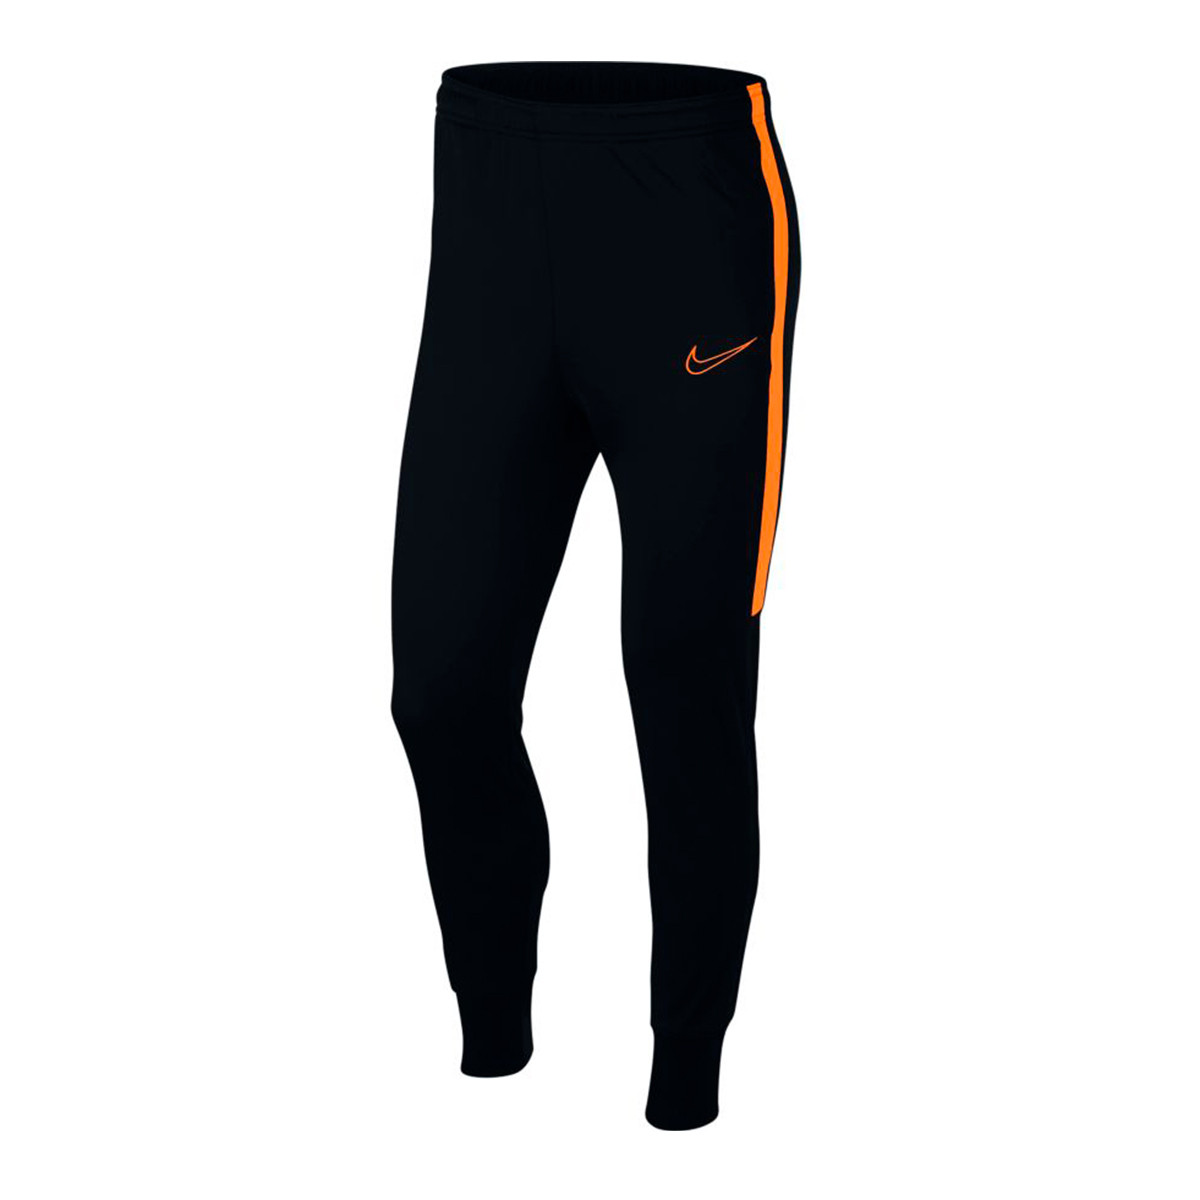 pantalon nike orange